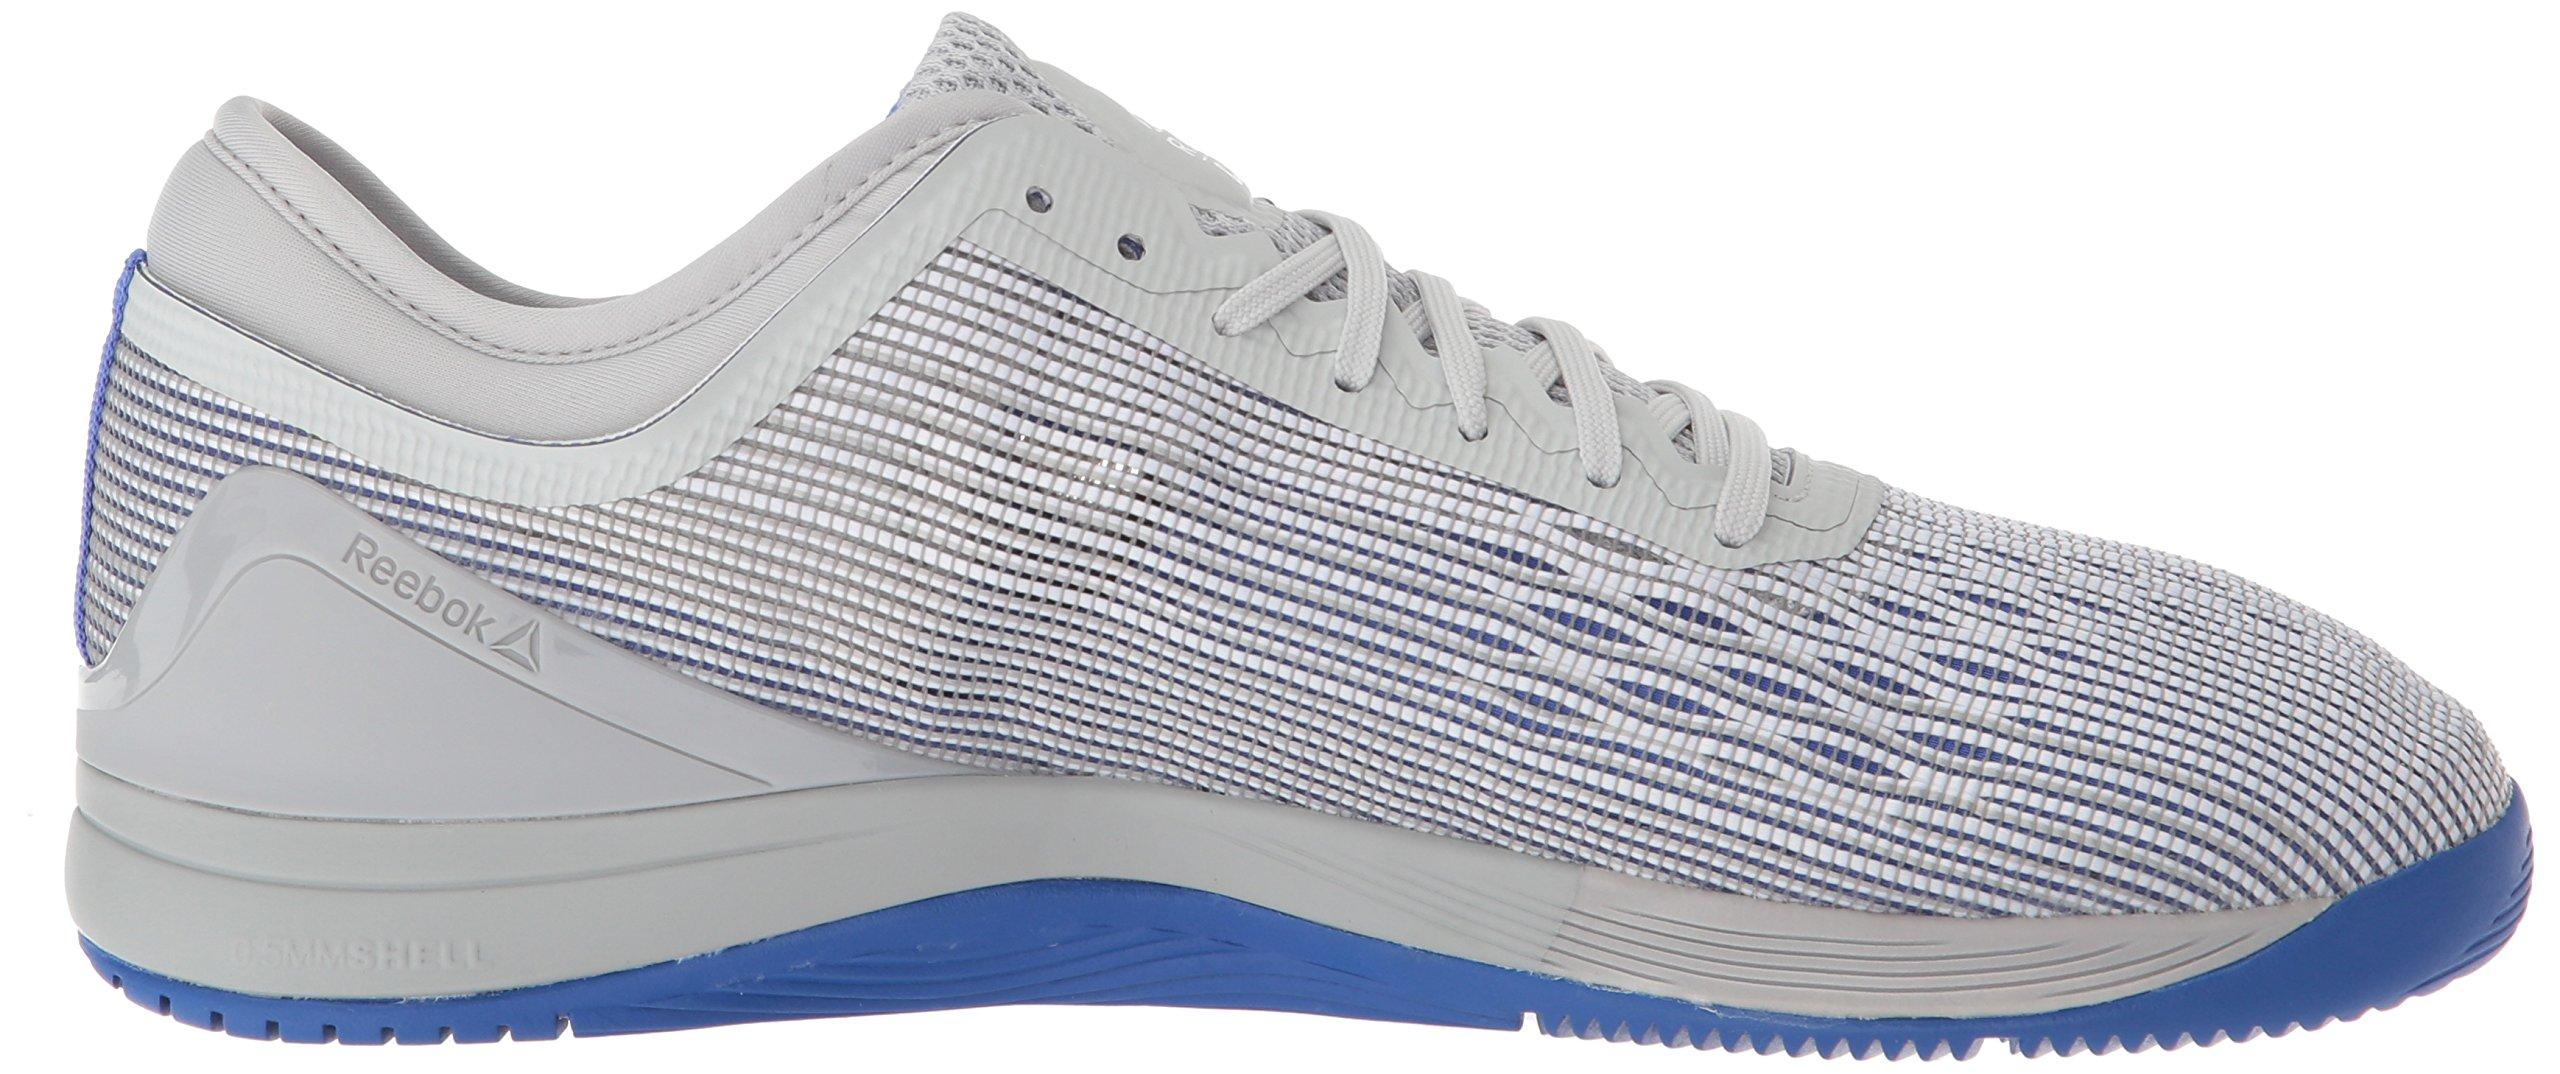 Reebok Men's CROSSFIT Nano 8.0 Sneaker, White/Stark Grey/Skull GR, 6.5 M US by Reebok (Image #6)